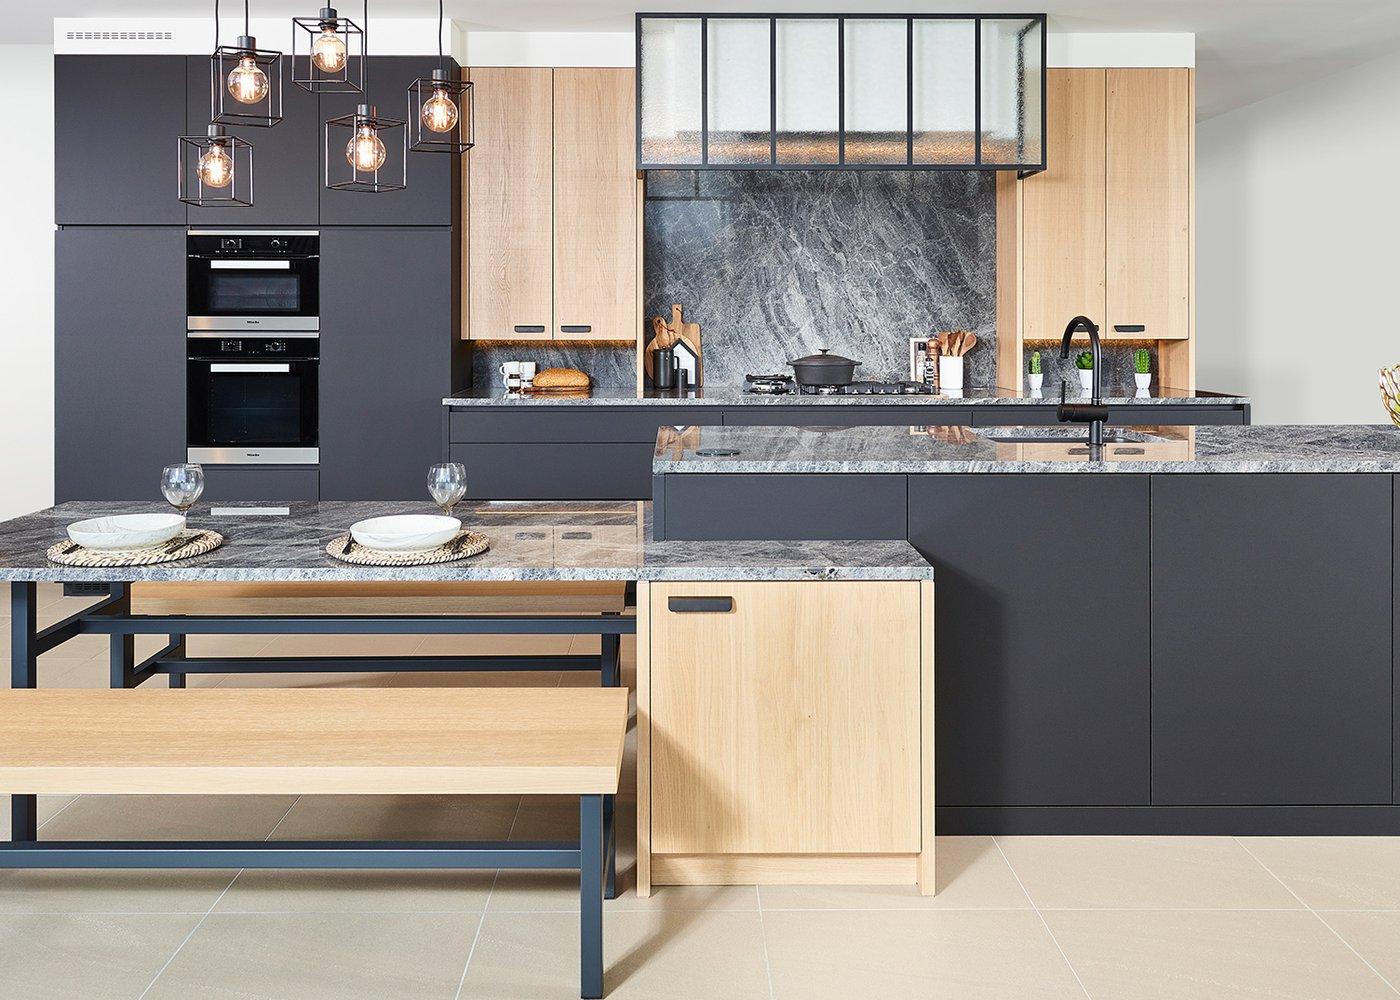 Moderne zwarte keuken met 'scarved' fineer eik - Model Design-Toronto